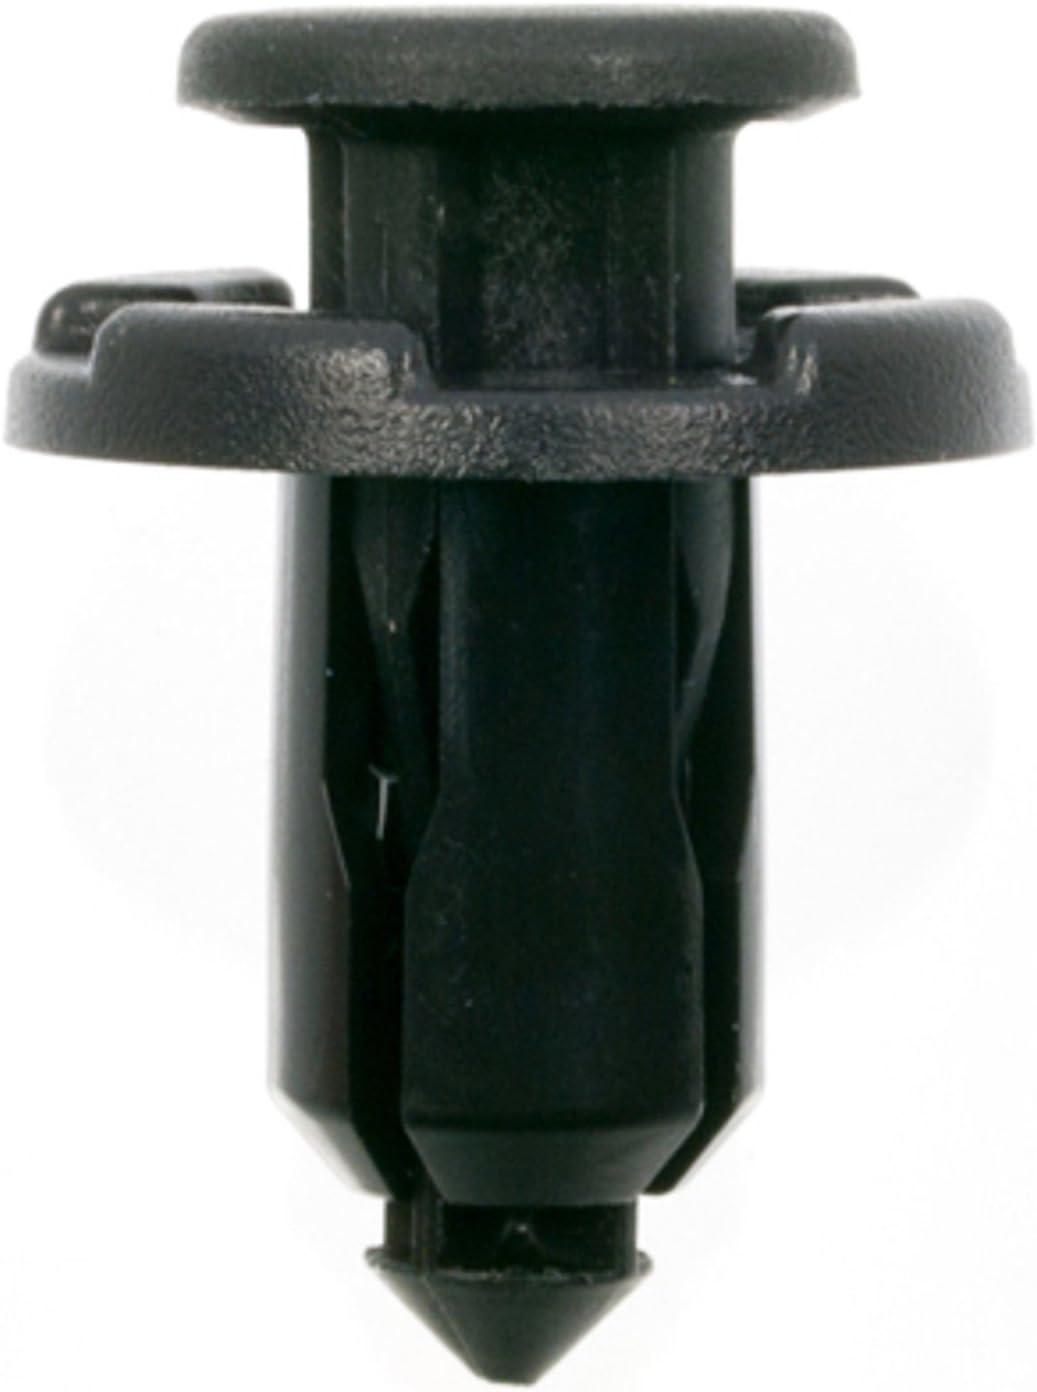 20pcs Bumper Engine Cover Fender Grille Clips Fastener for Subaru 90914-0007